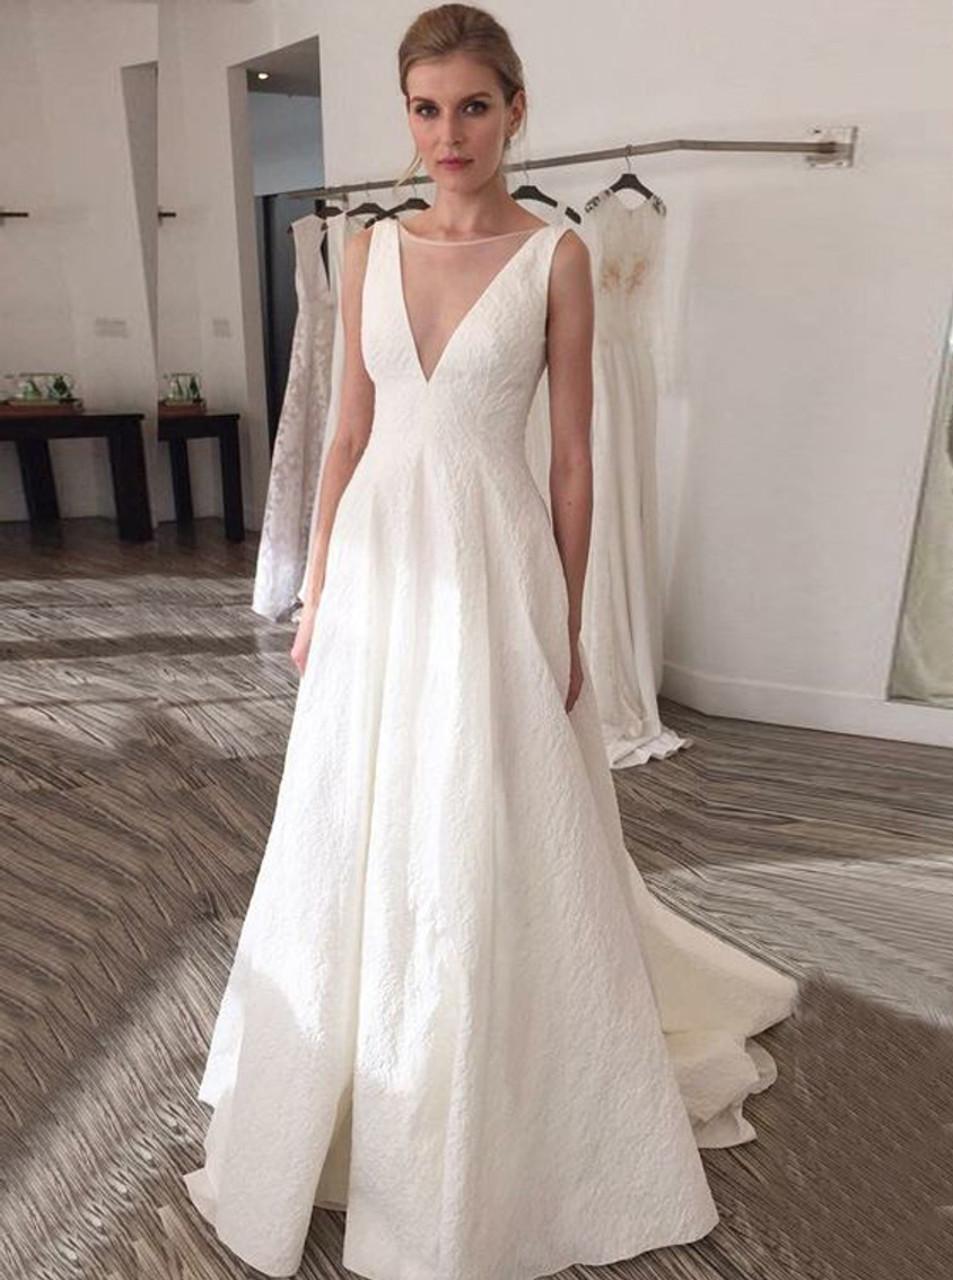 3db57701280f1 A Line V Neck Wedding Dress - Wedding Dress   Decore Ideas